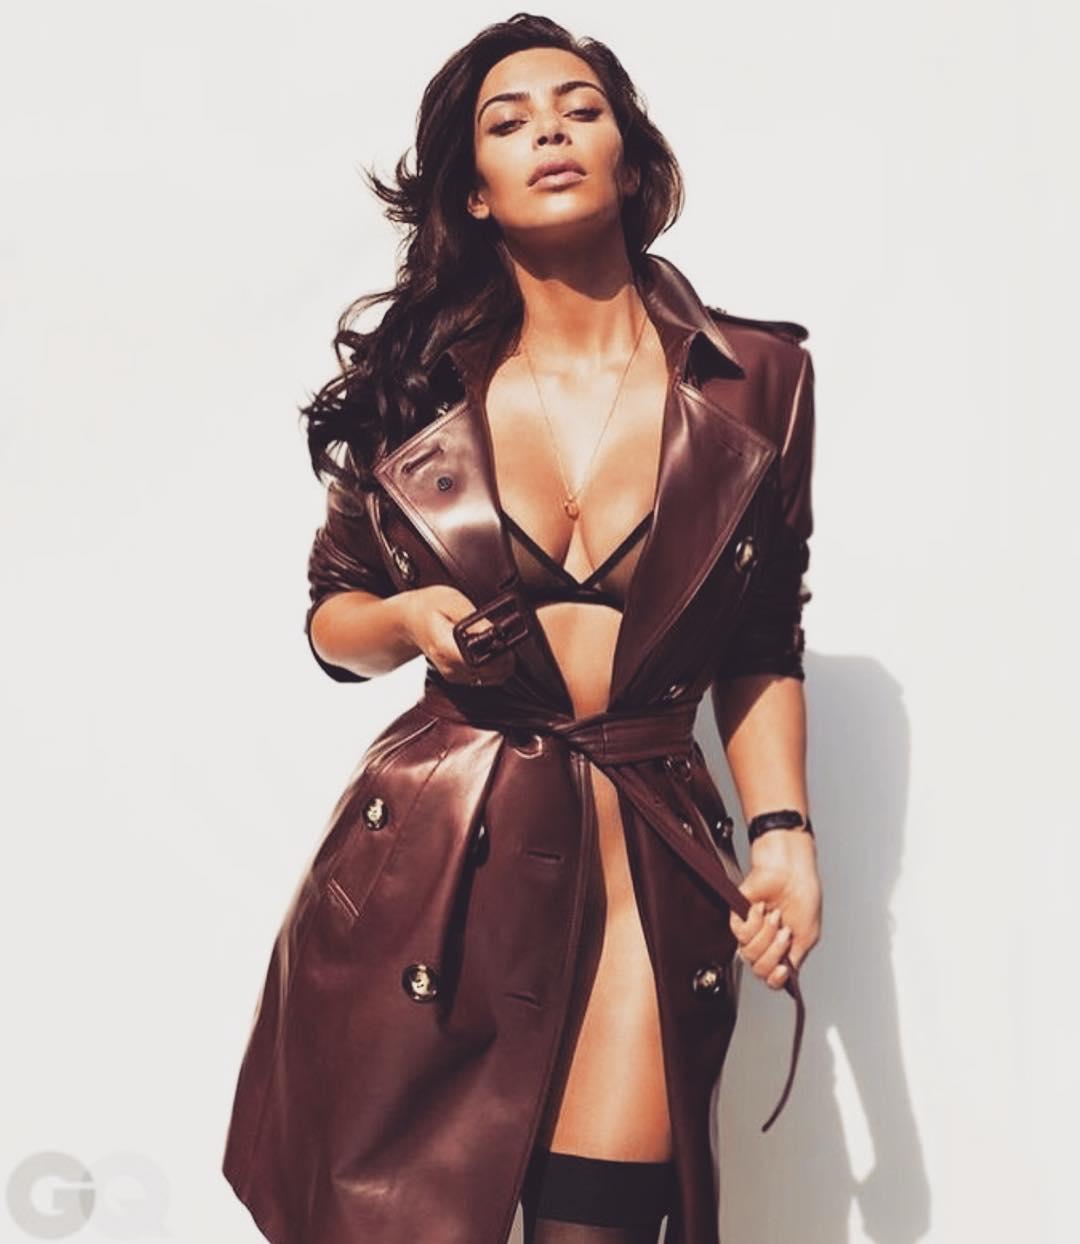 7cba8c54235fe41061ddd866b8cf68540407b969 Kim Kardashian spoke about the diet, thanks to which kicked off 30 kilograms